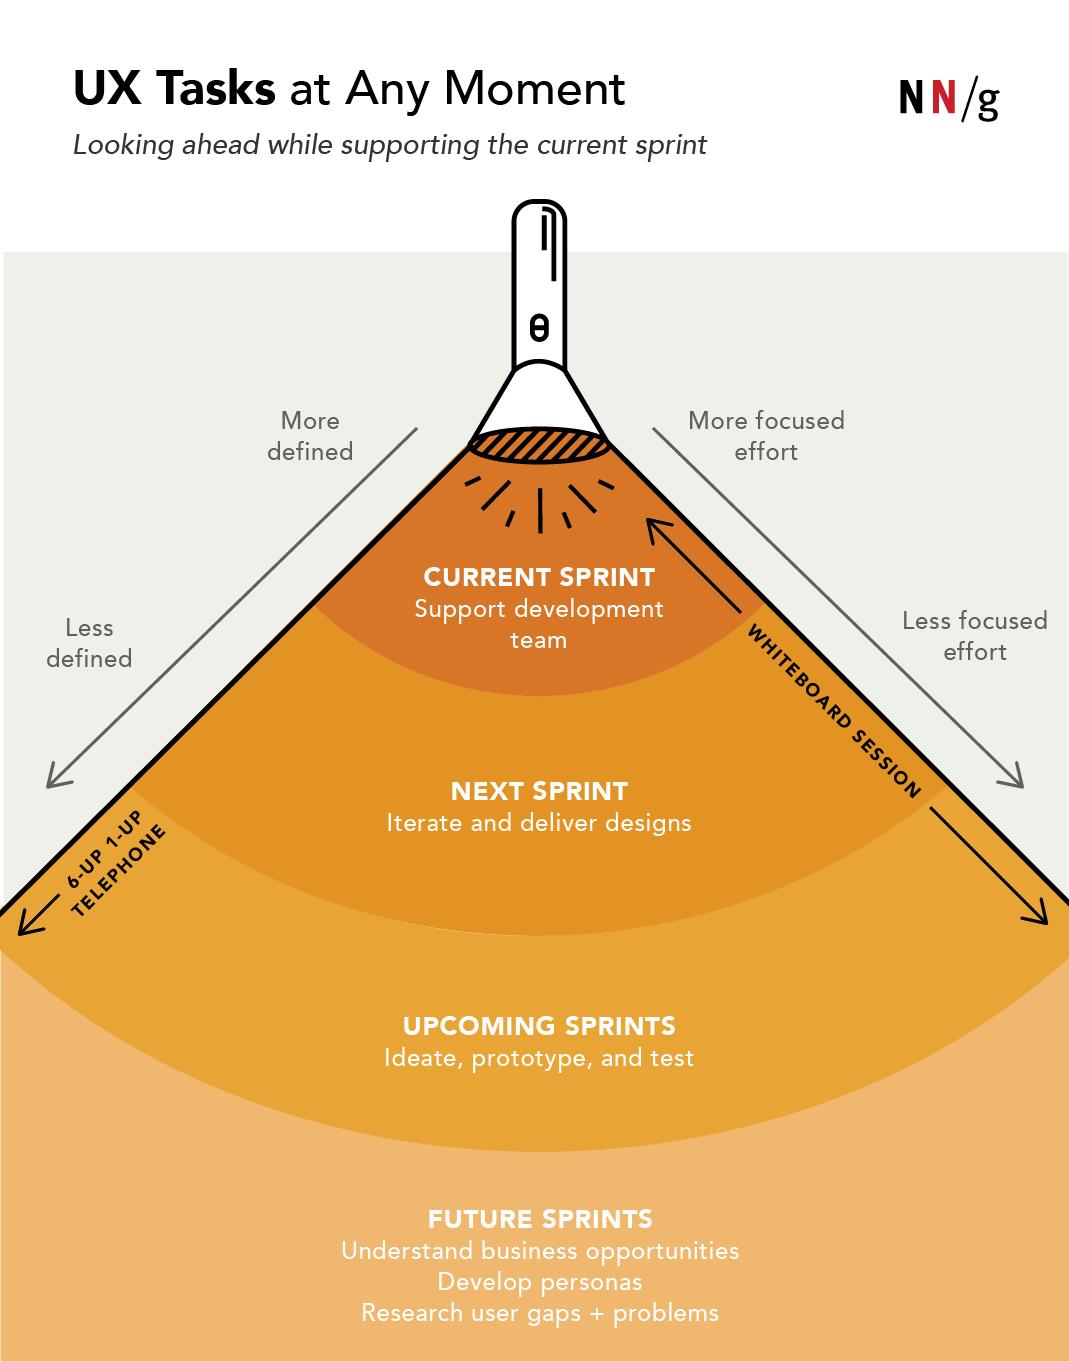 UX tasks at any moment flashlight